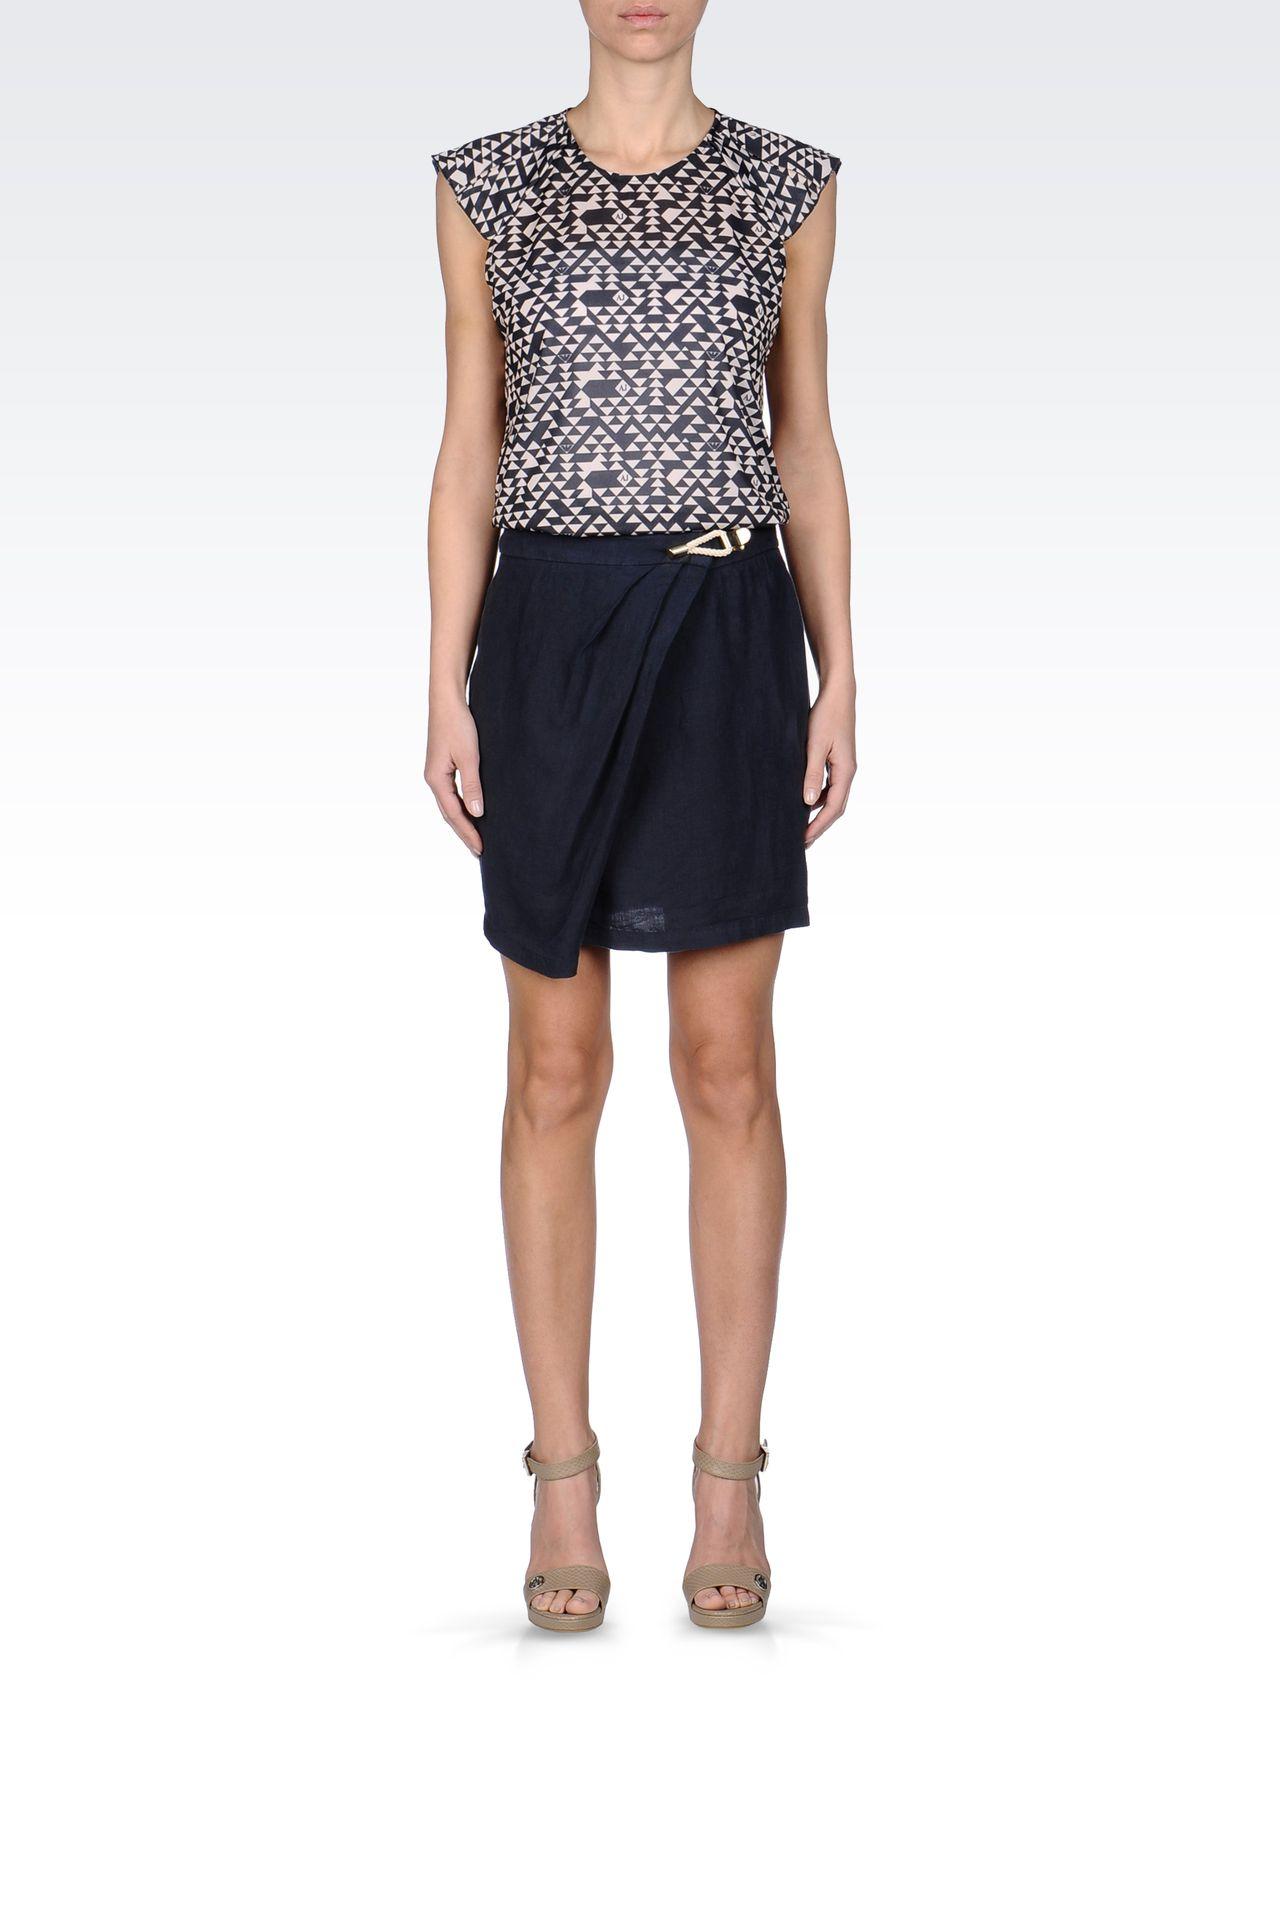 WRAPAROUND SKIRT IN LINEN: Mini skirts Women by Armani - 0